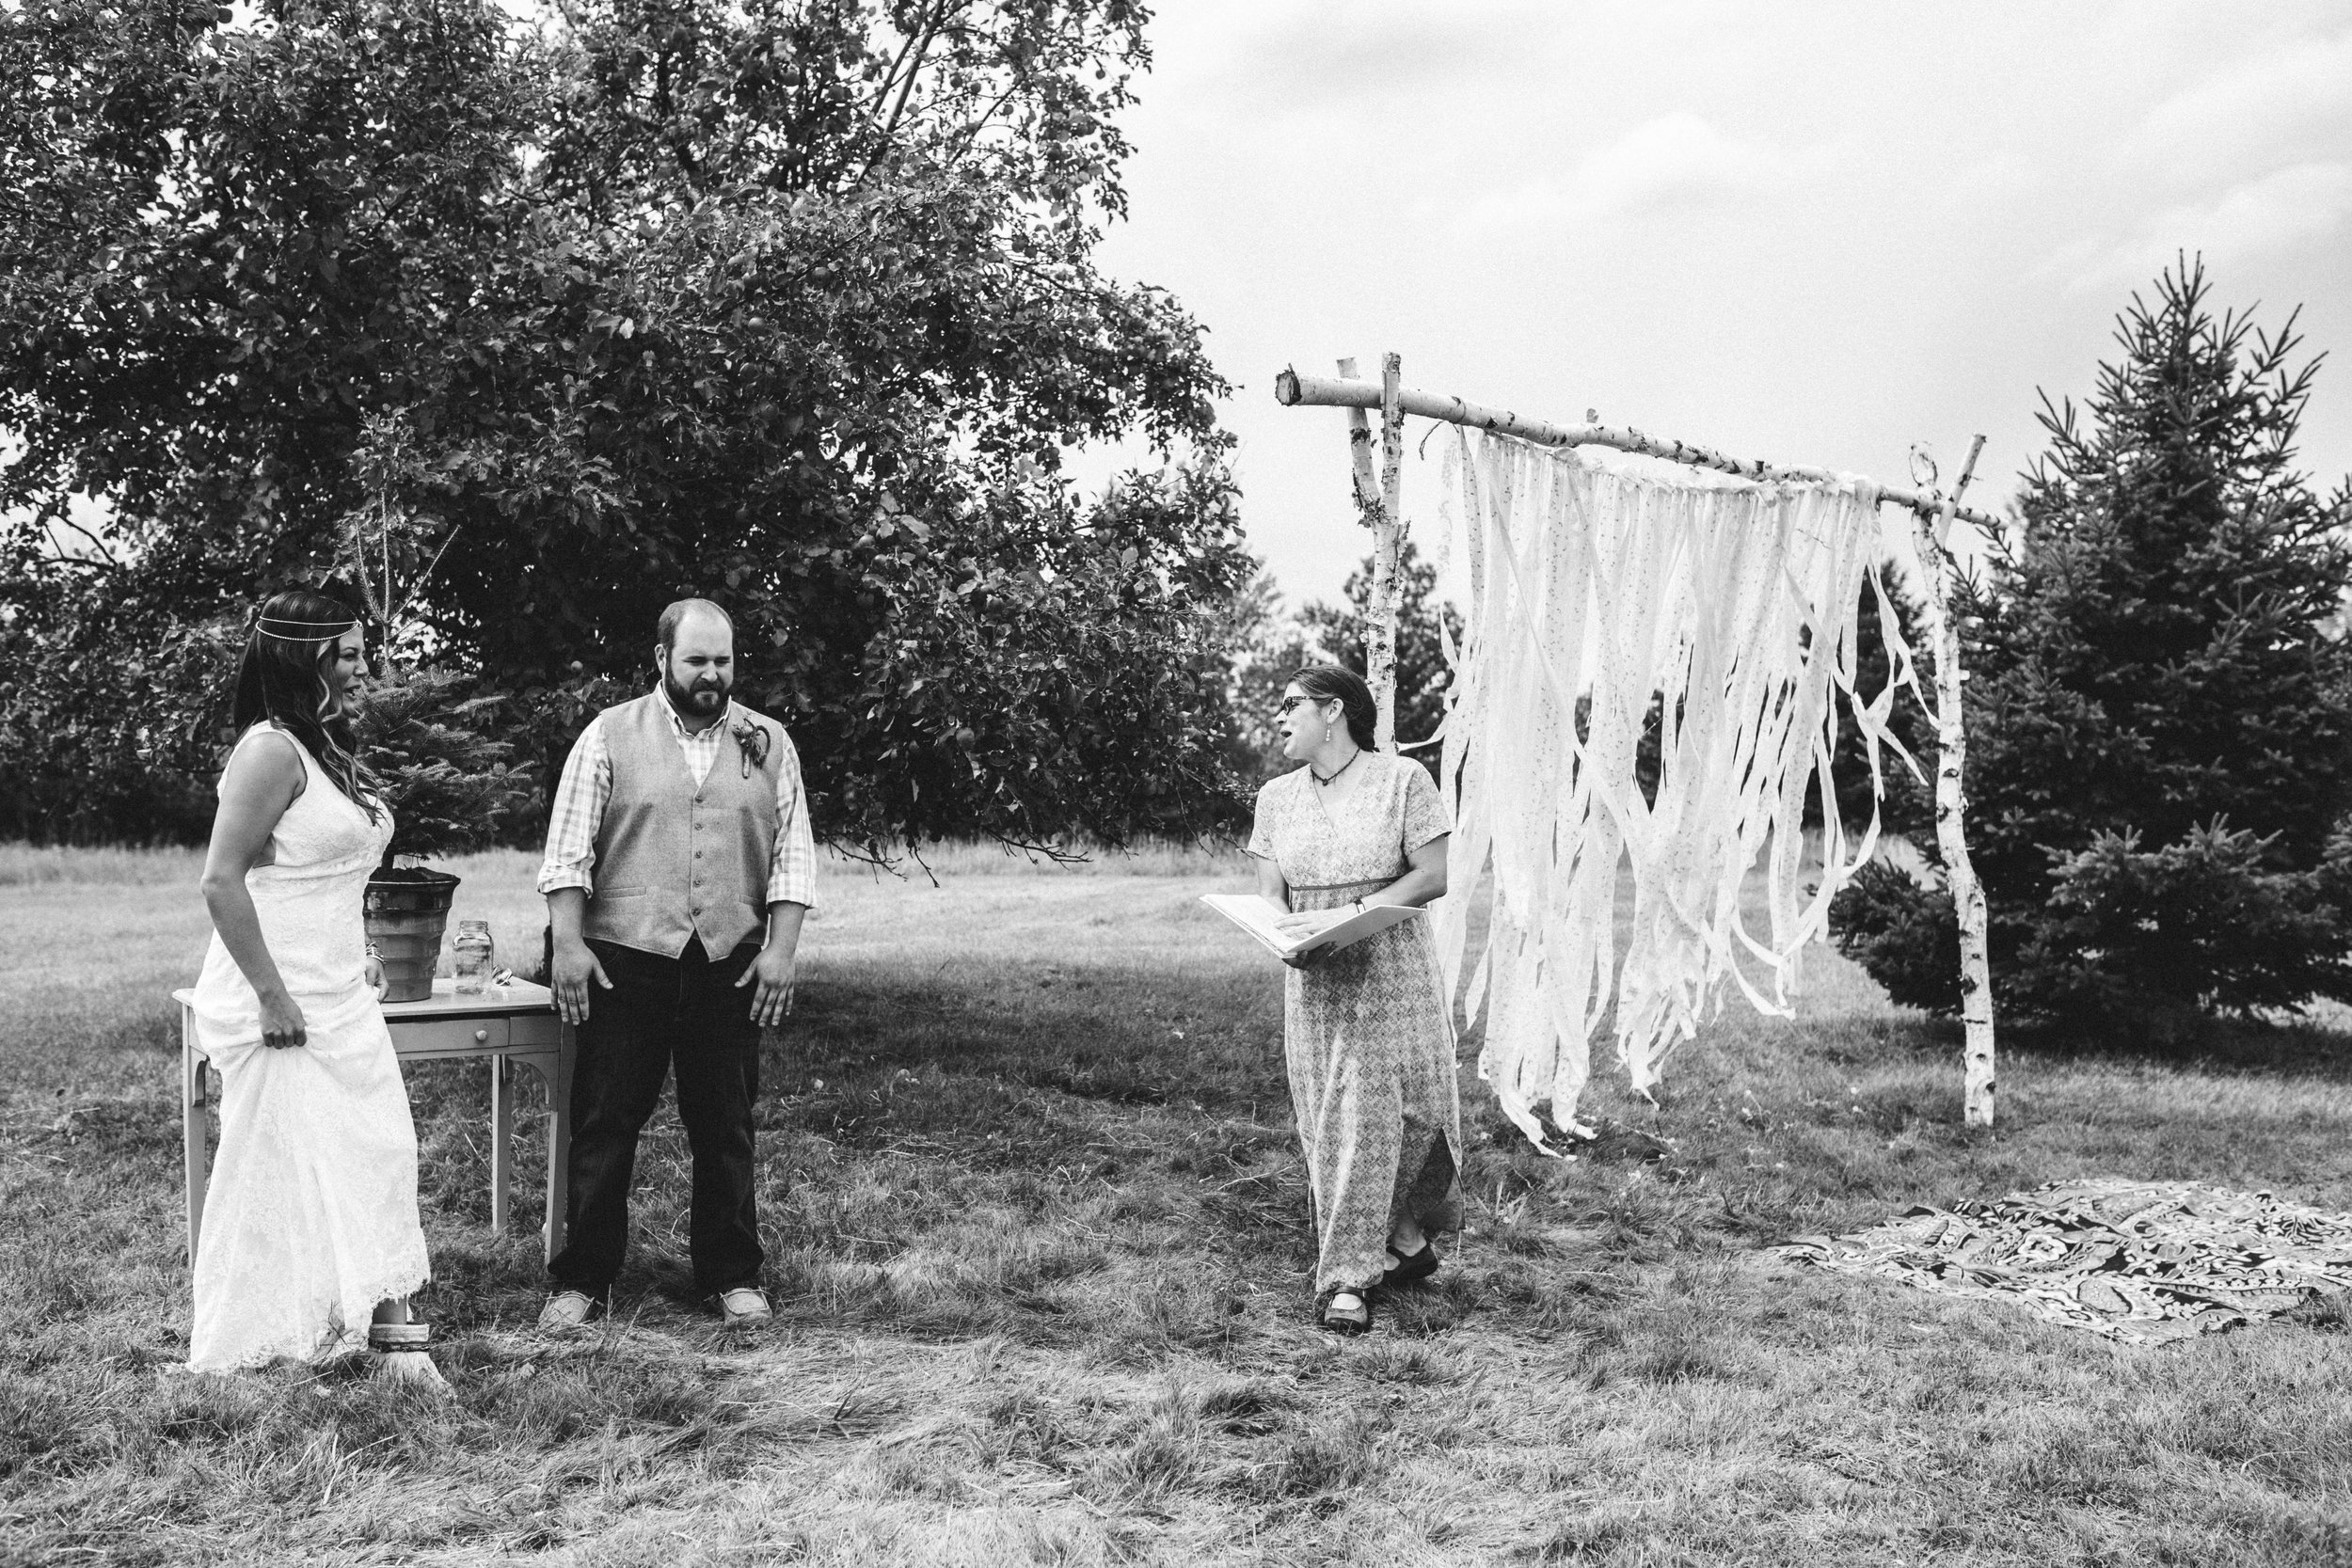 Bohemian Wedding - Sabrina Leigh Studios - Northern Michigan Wedding Photographer050.jpg